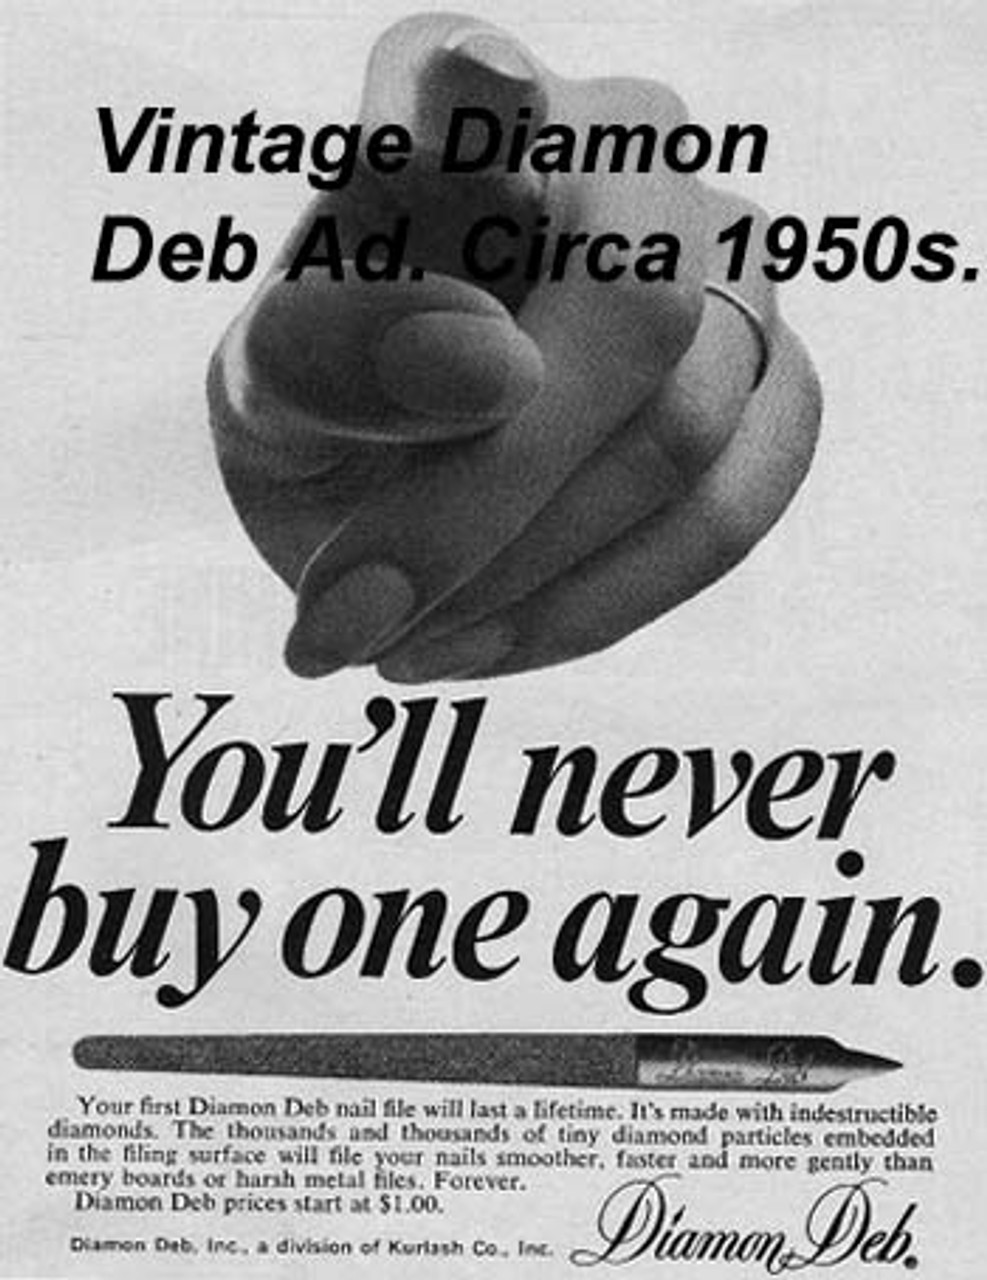 A vintage Diamond Deb Nail File ad